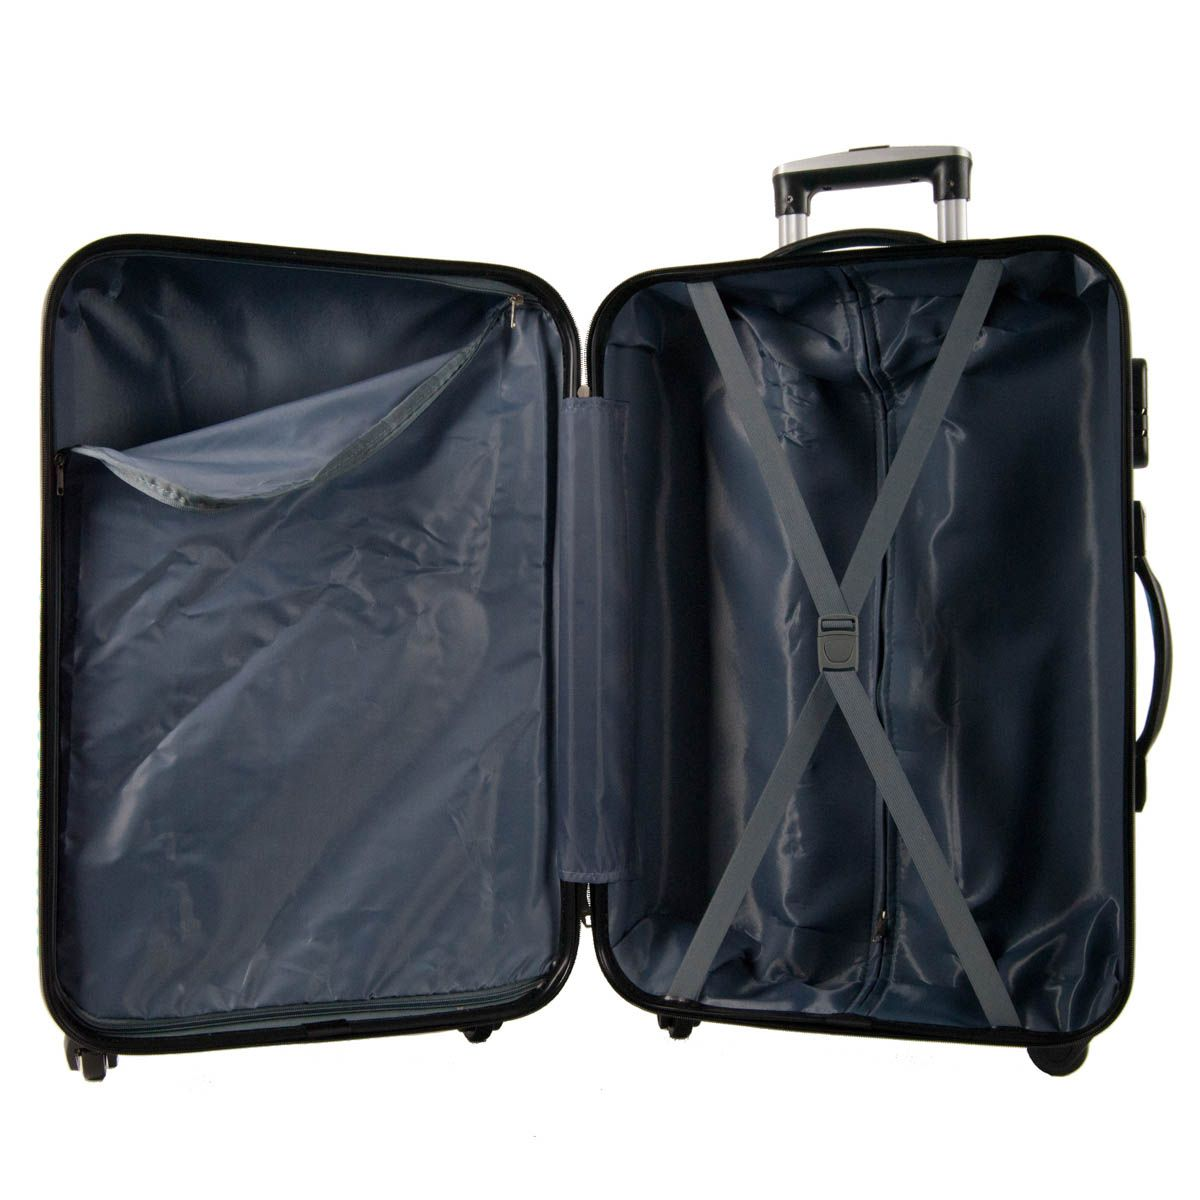 Montevita Abs Suitcase in Beige